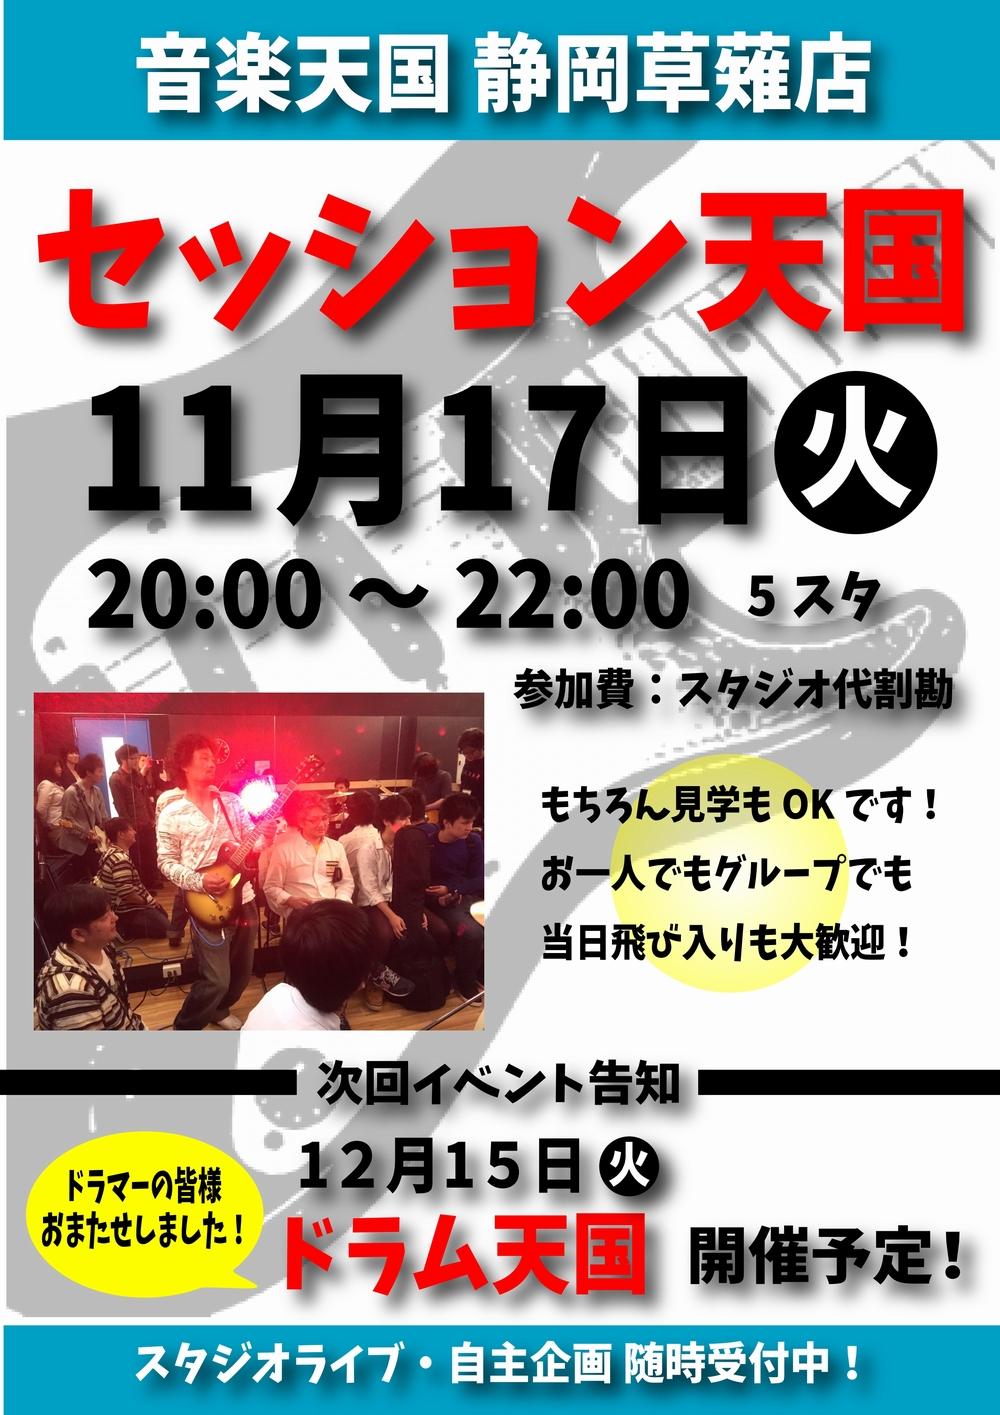 【セッション天国】@音楽天国・静岡草薙店11月17日(火)開催